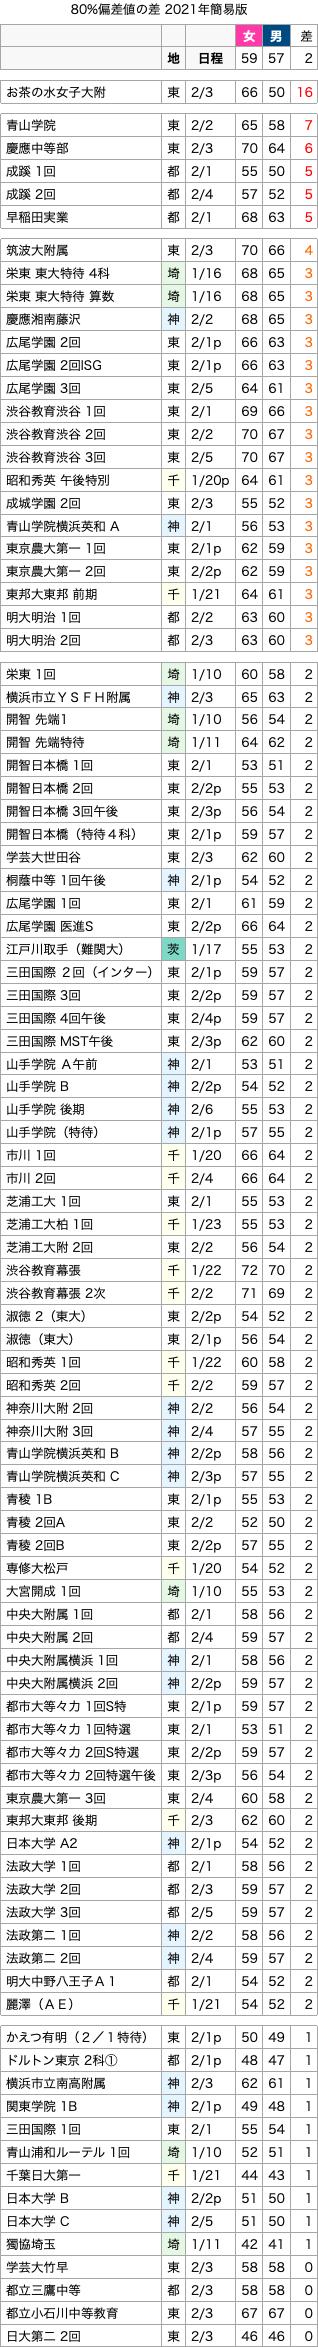 https://e-tutor.tokyo/data/20210512/11.png